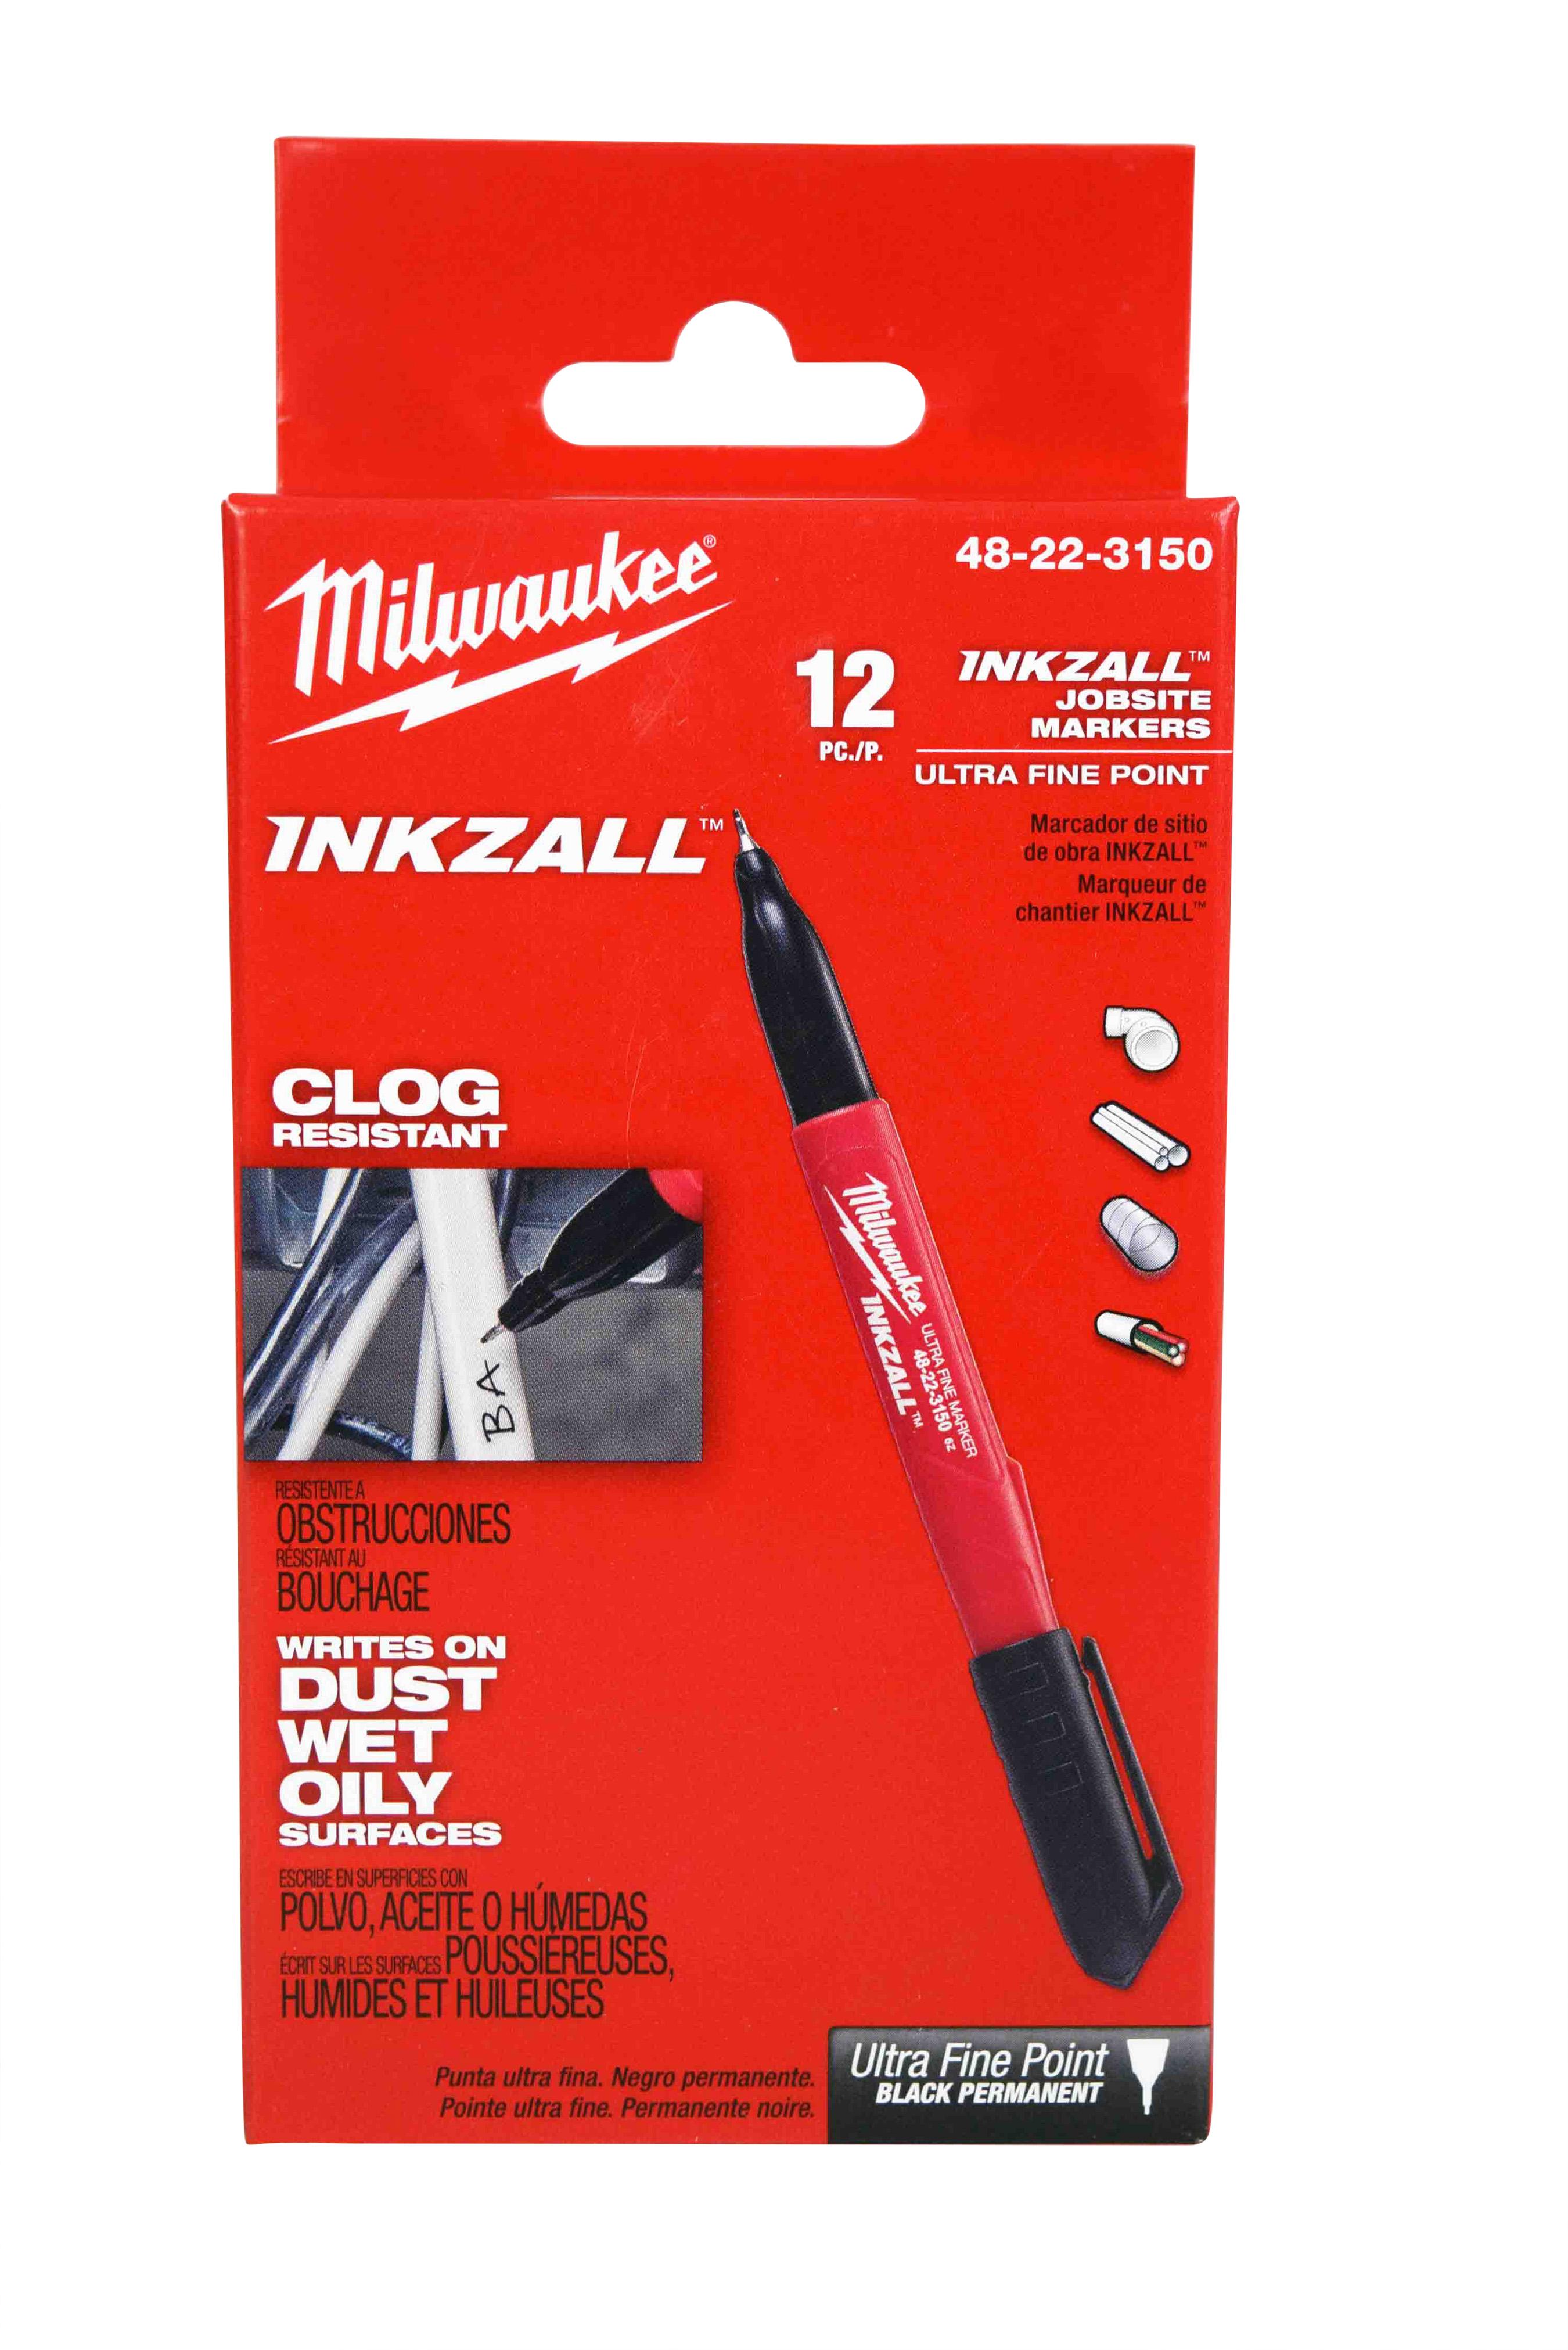 Milwaukee-48-22-3150-Inkzall-Black-Ultra-Fine-Point-Markers-12PK-image-5